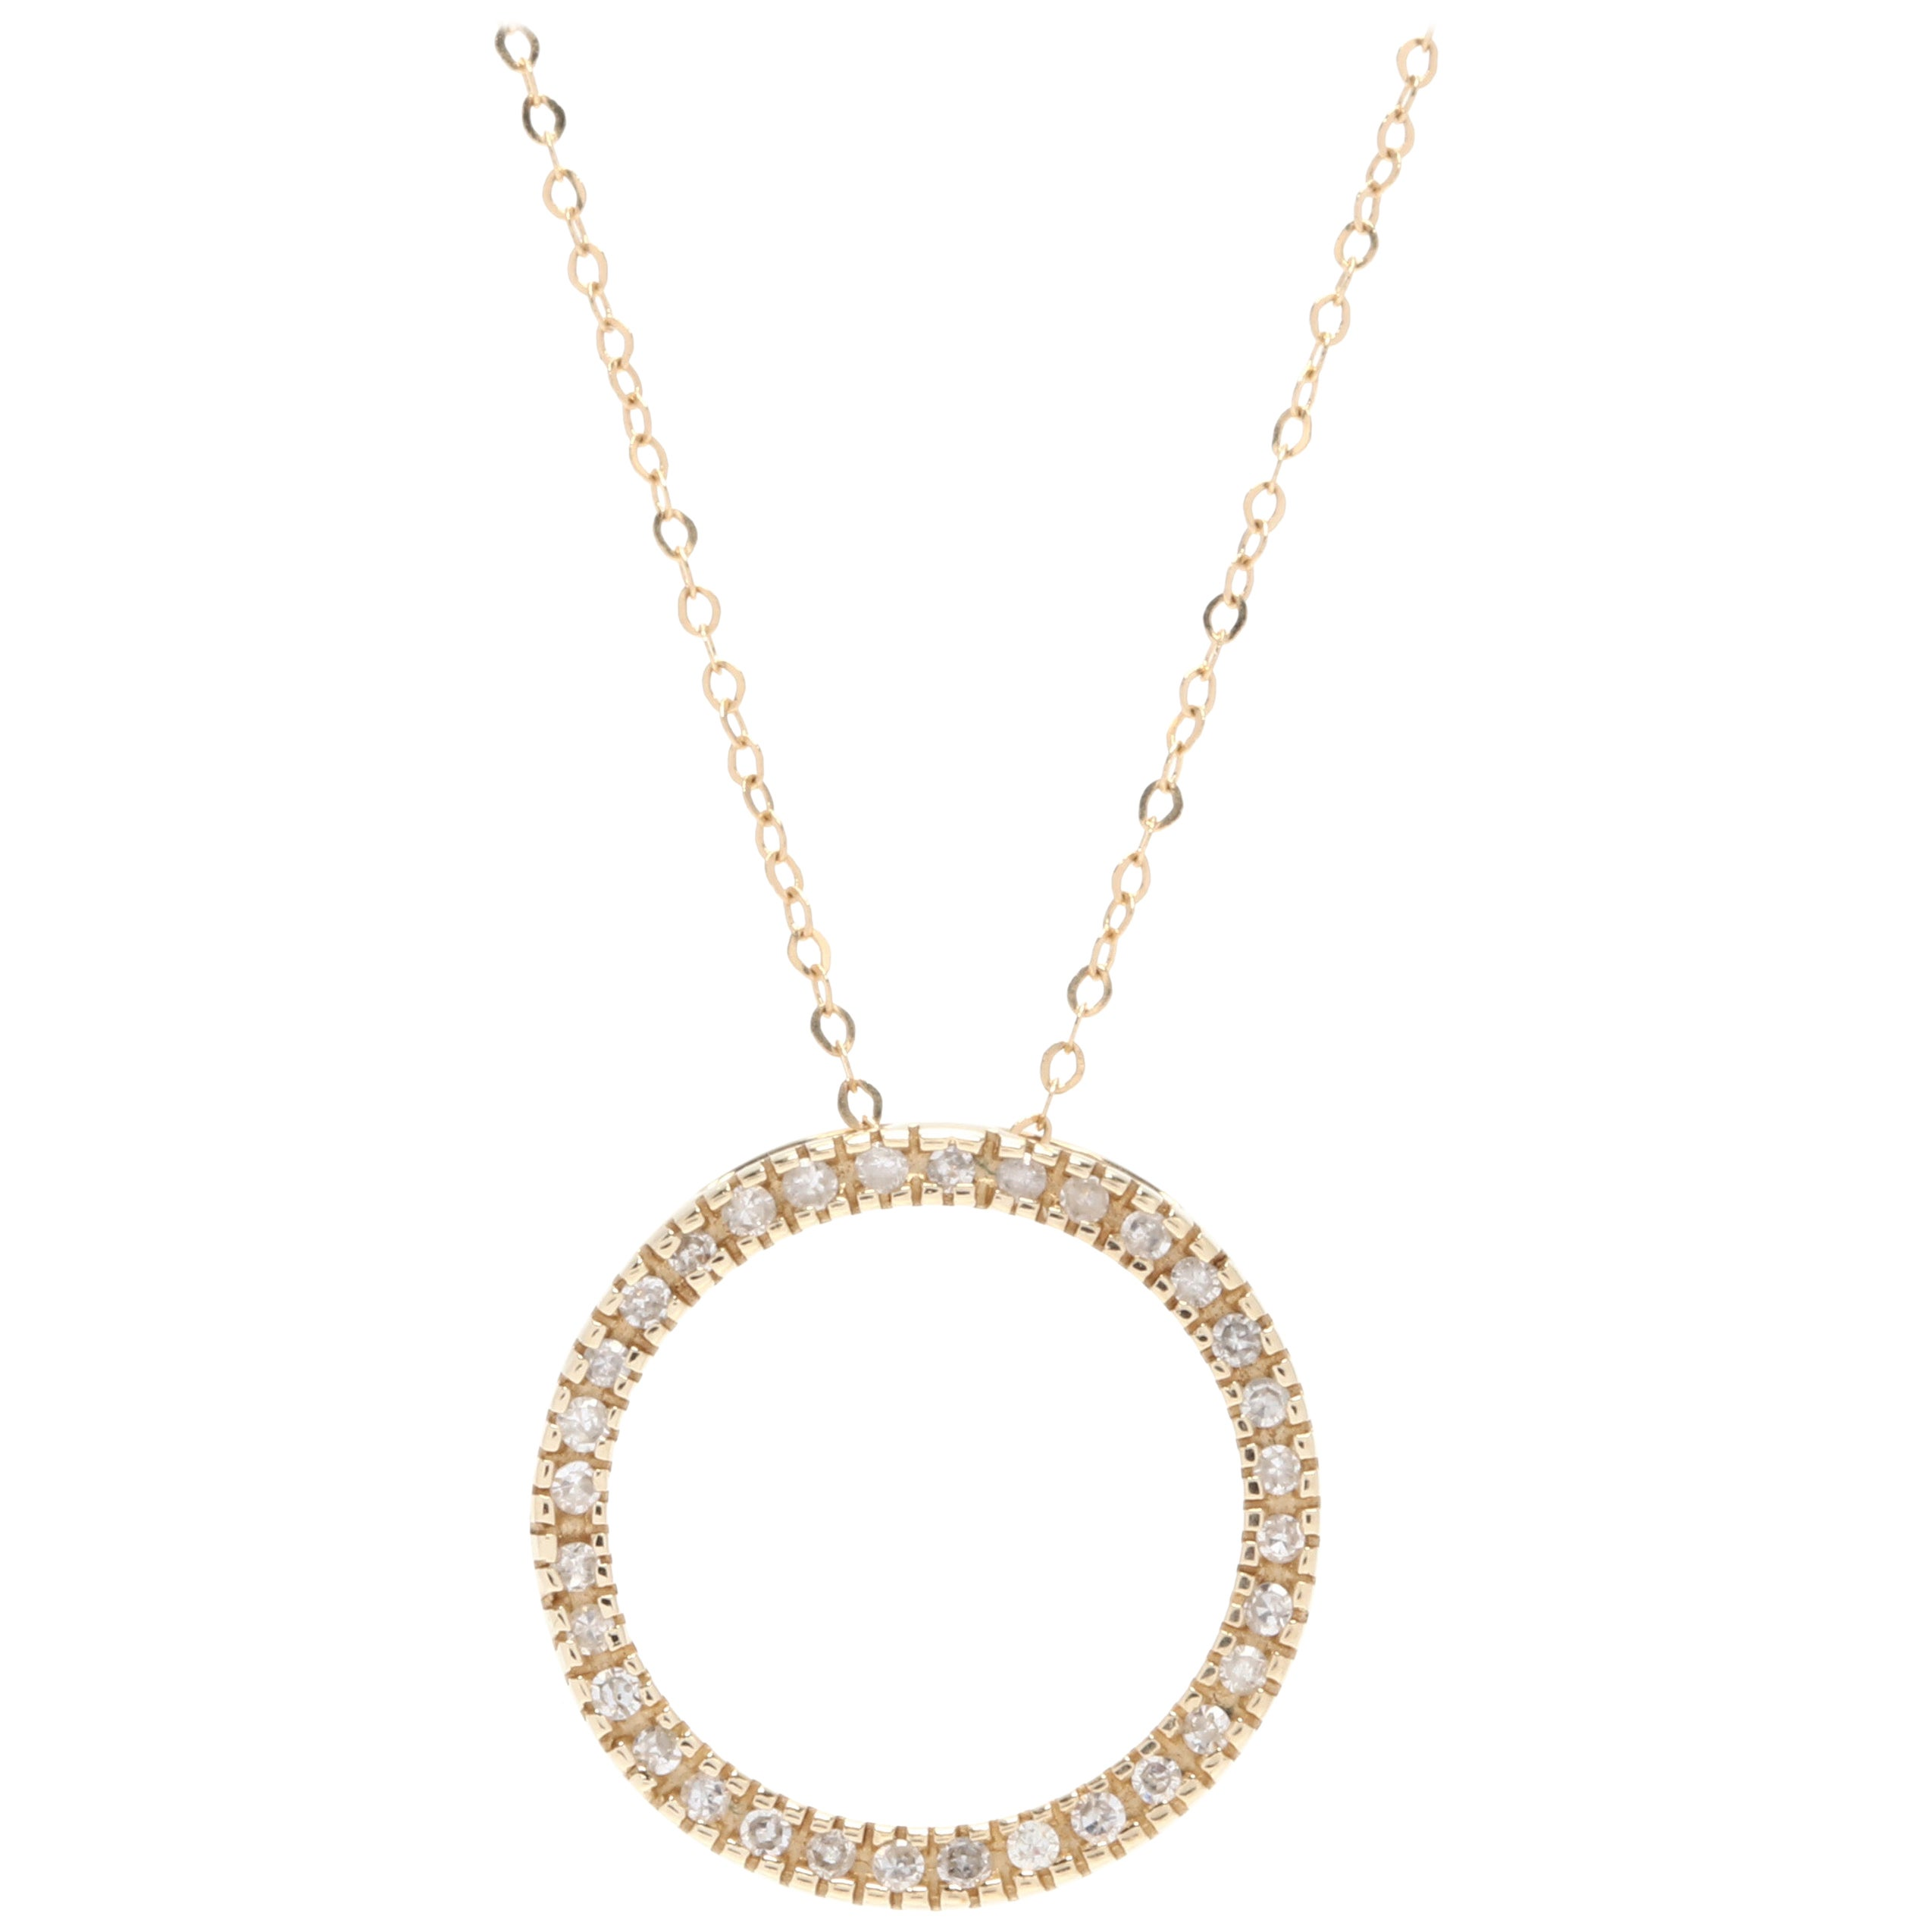 18-14 Karat Yellow Gold Diamond Circle Pendant Necklace